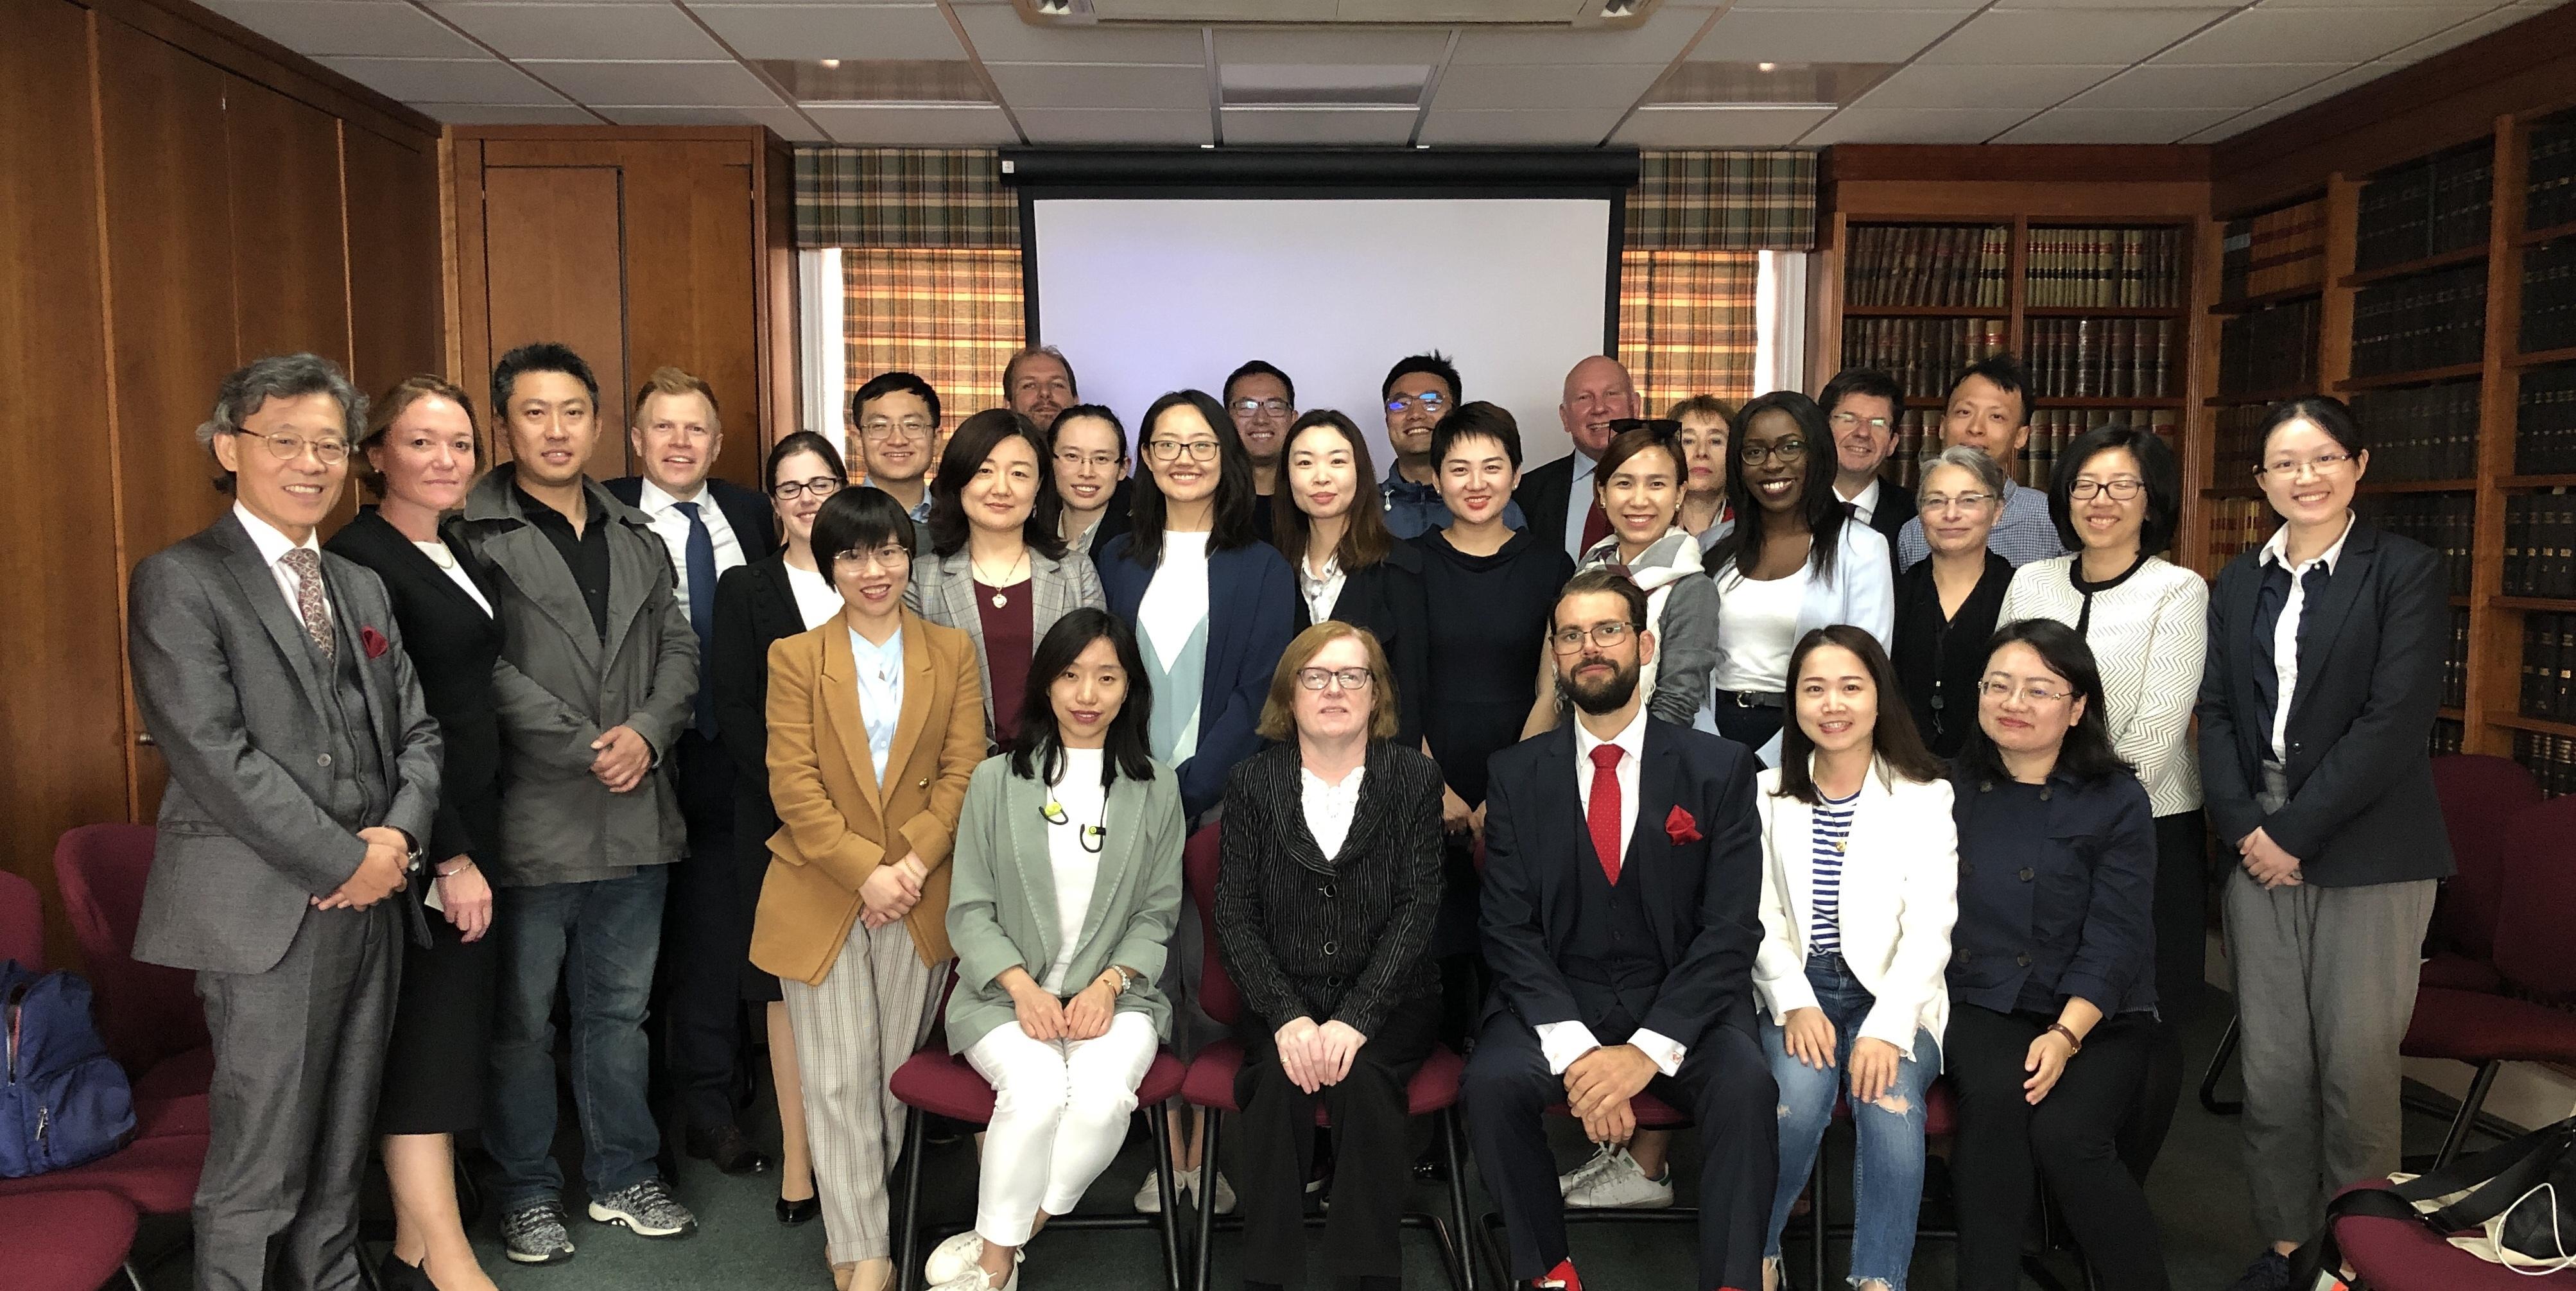 chinese-lawyers-19.jpg#asset:4585